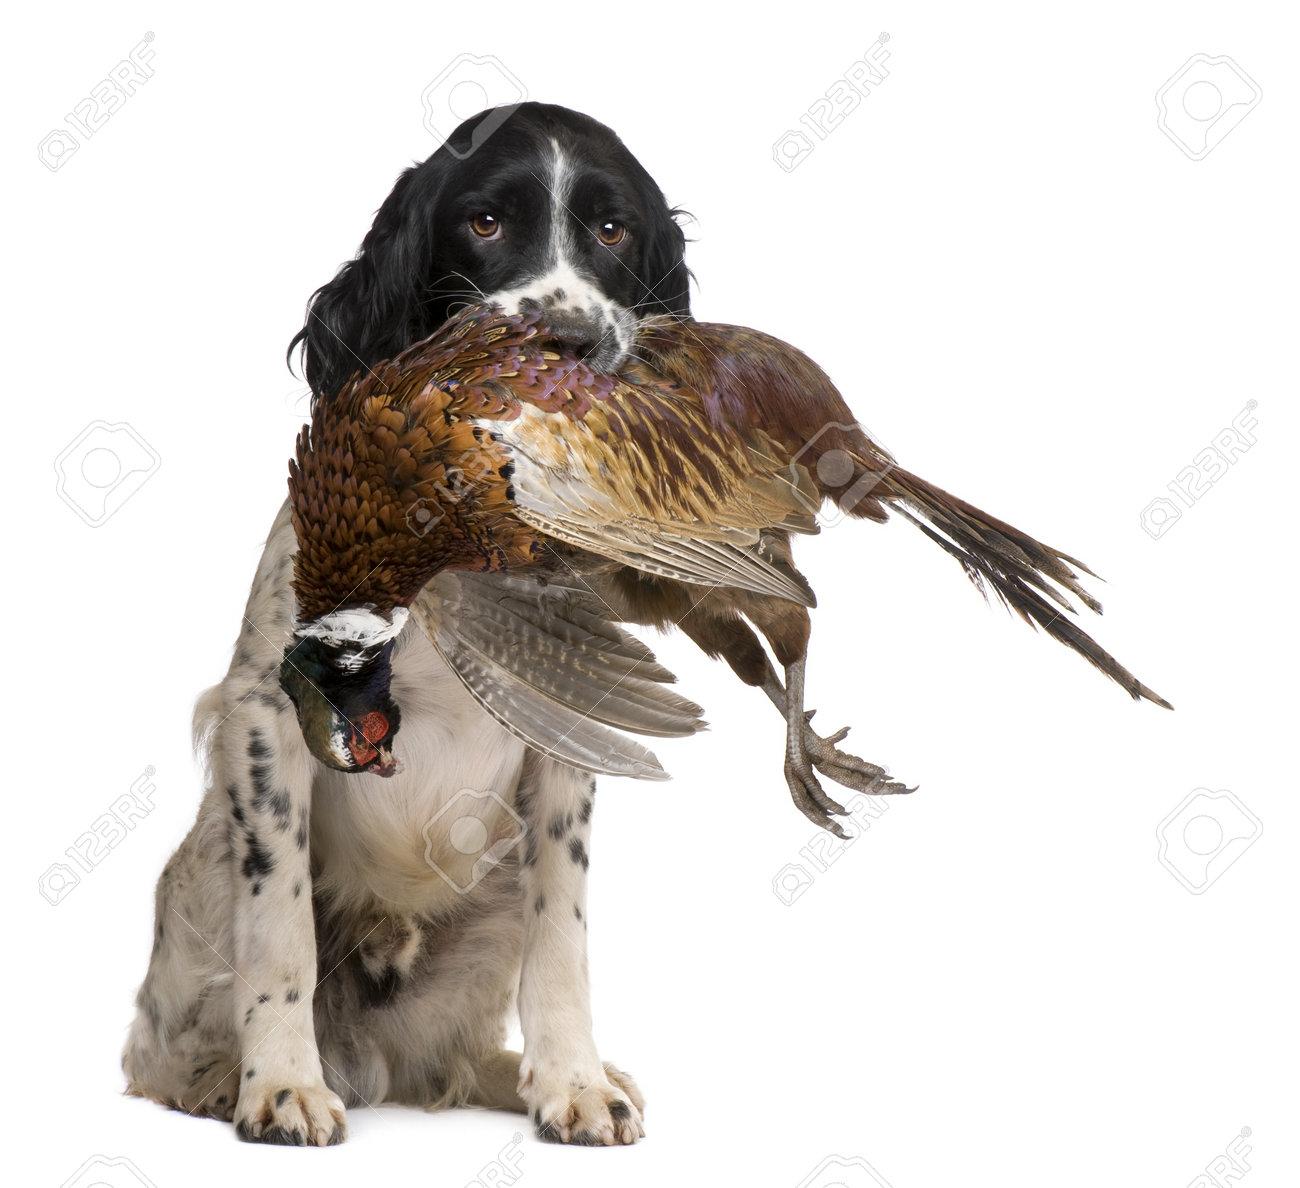 English Springer Spaniel Pheasant Hunting English Springer Spaniel